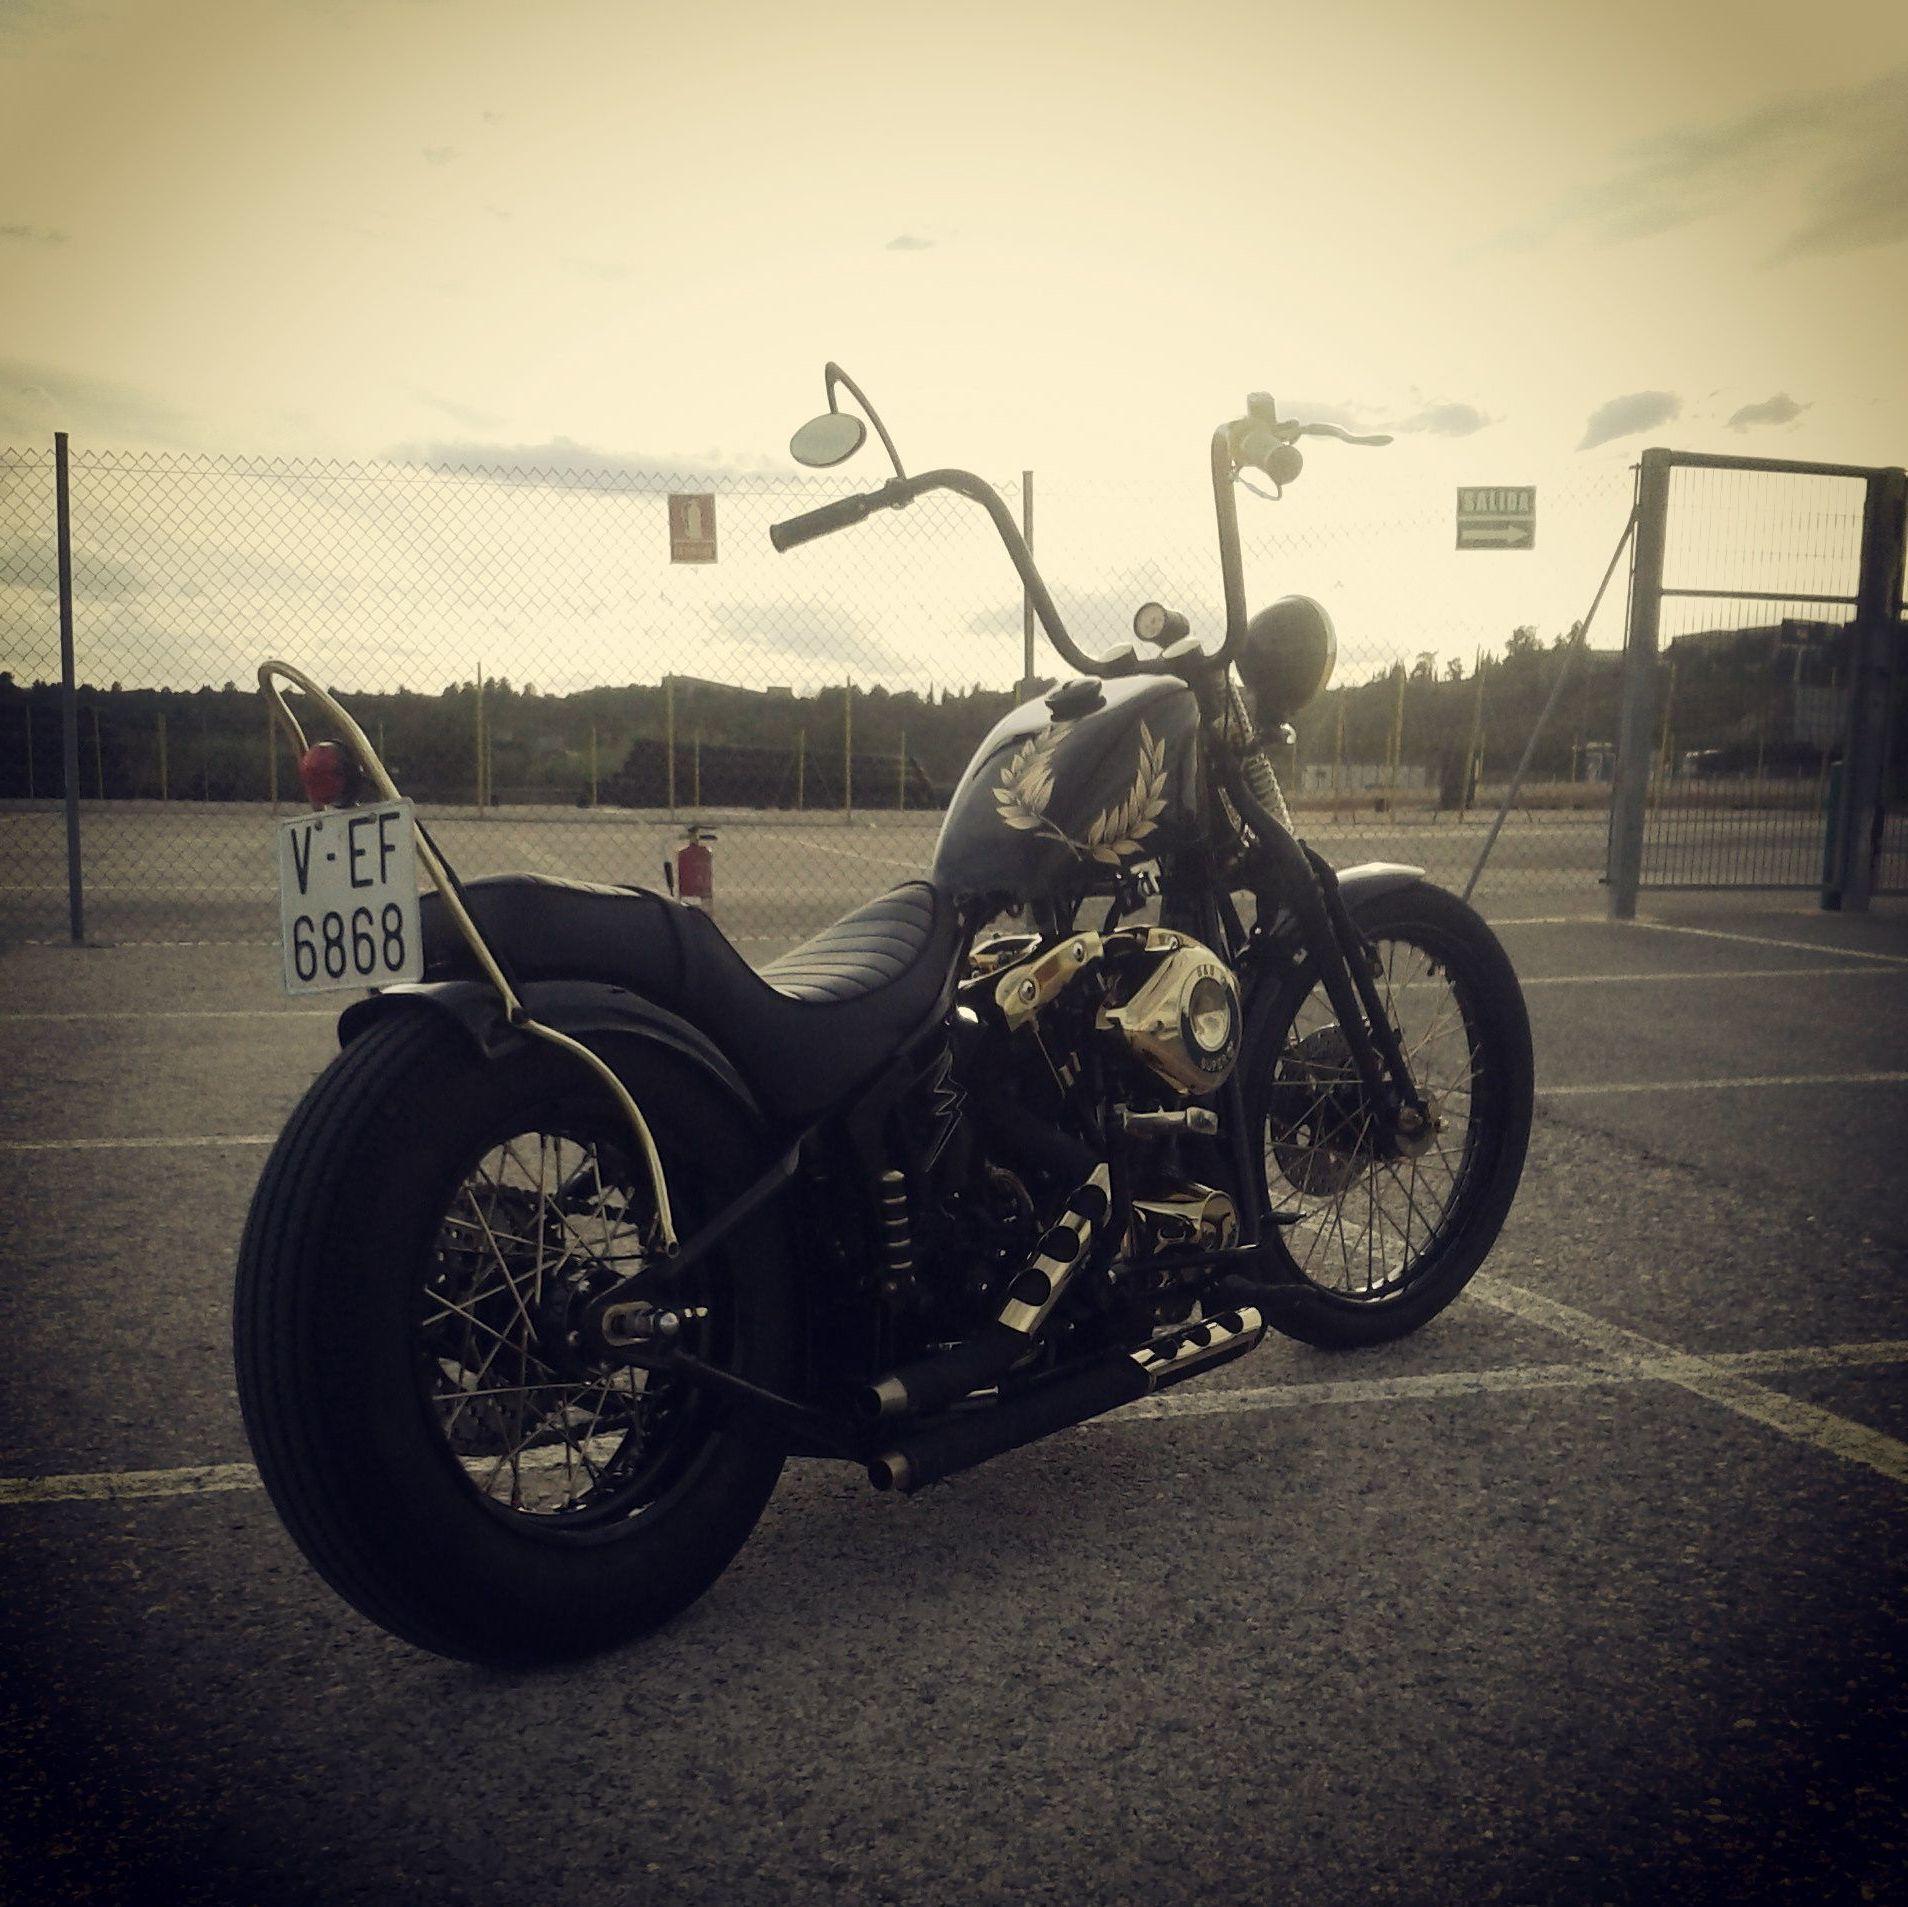 customizar motos, transformacion moto, transformacion harley davidson, personalizacion motos custom,